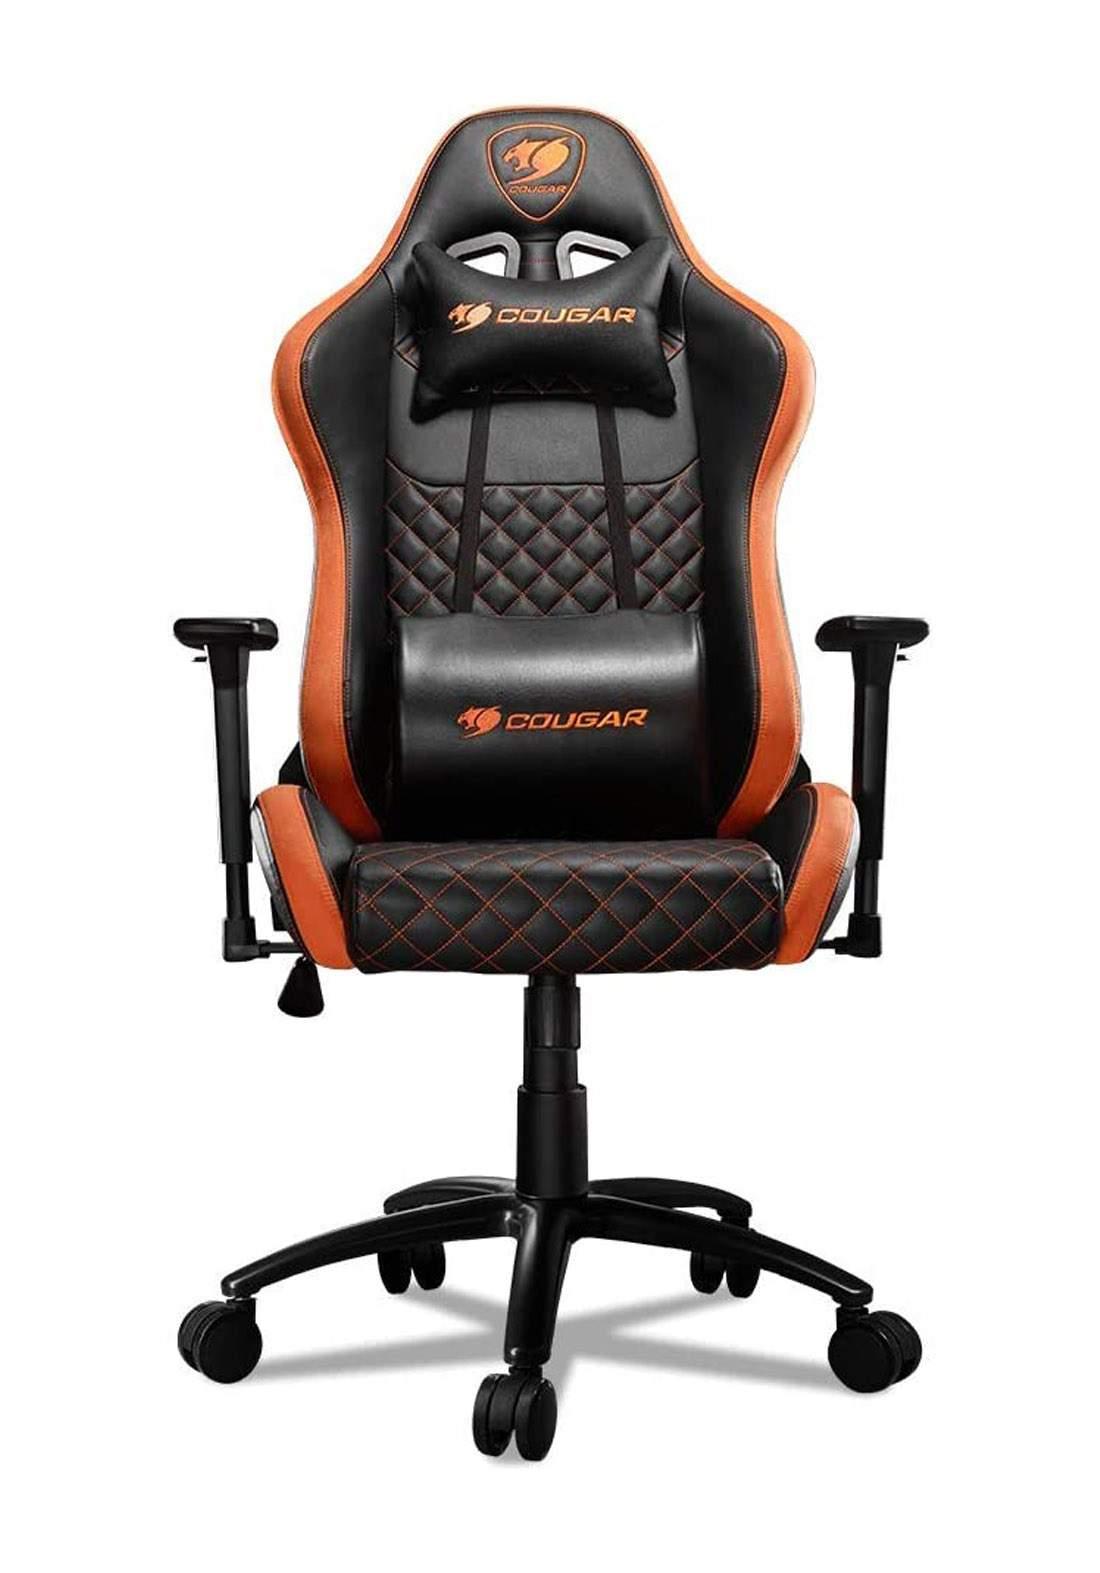 Cougar Armor Pro Gaming Chair - Black and Orange  كرسي العاب